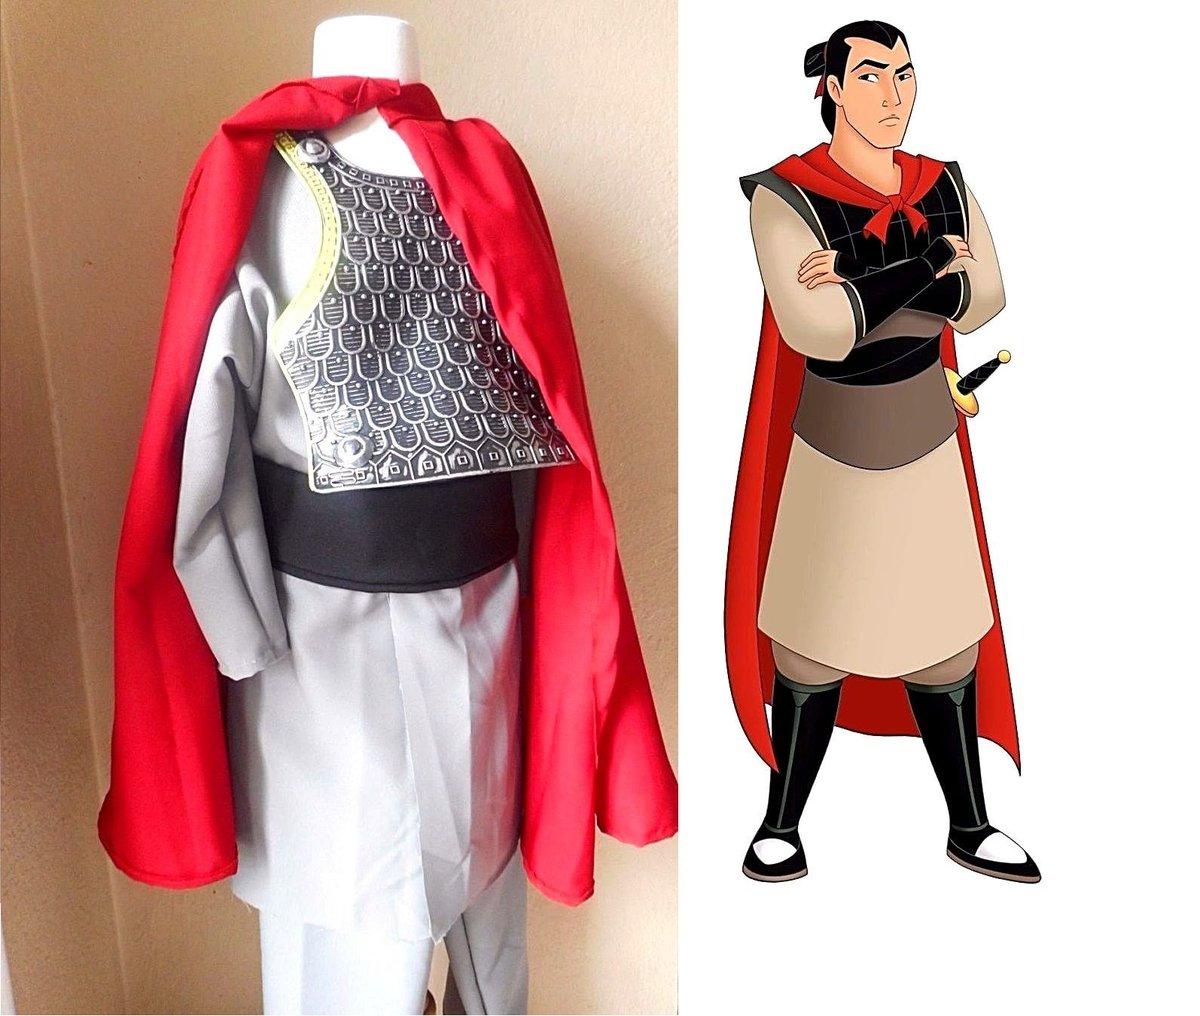 ... com/itm/Li-Shang-Mulan-complete-costume-cape-set-for-Adult-size-S-L-Disney-bound-/282613720827?varu003du0026hashu003ditem41cd1726fbmmr-fM3eKSjg06jyhJBk_r5g u2026  sc 1 st  Twitter & Pretty Elegance on Twitter: